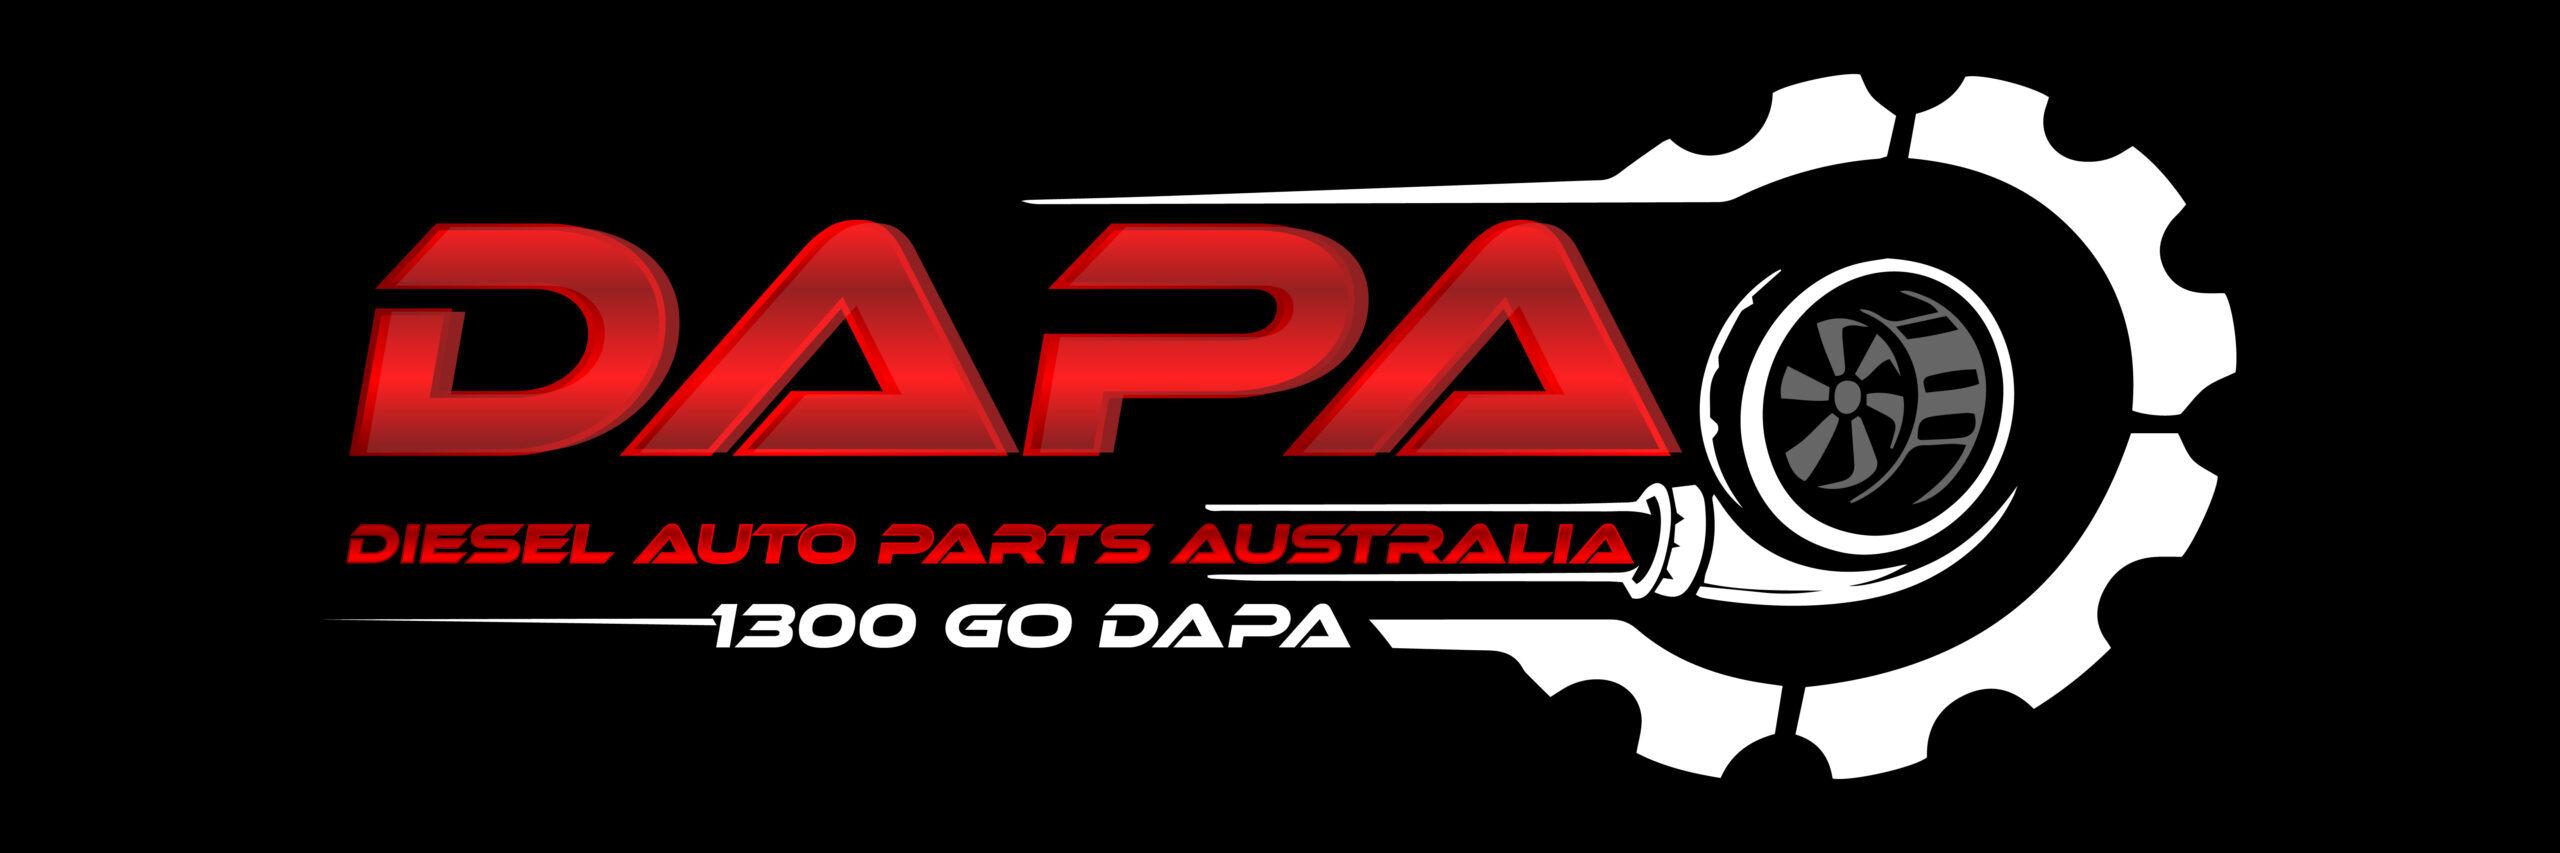 Diesel Auto Parts Australia